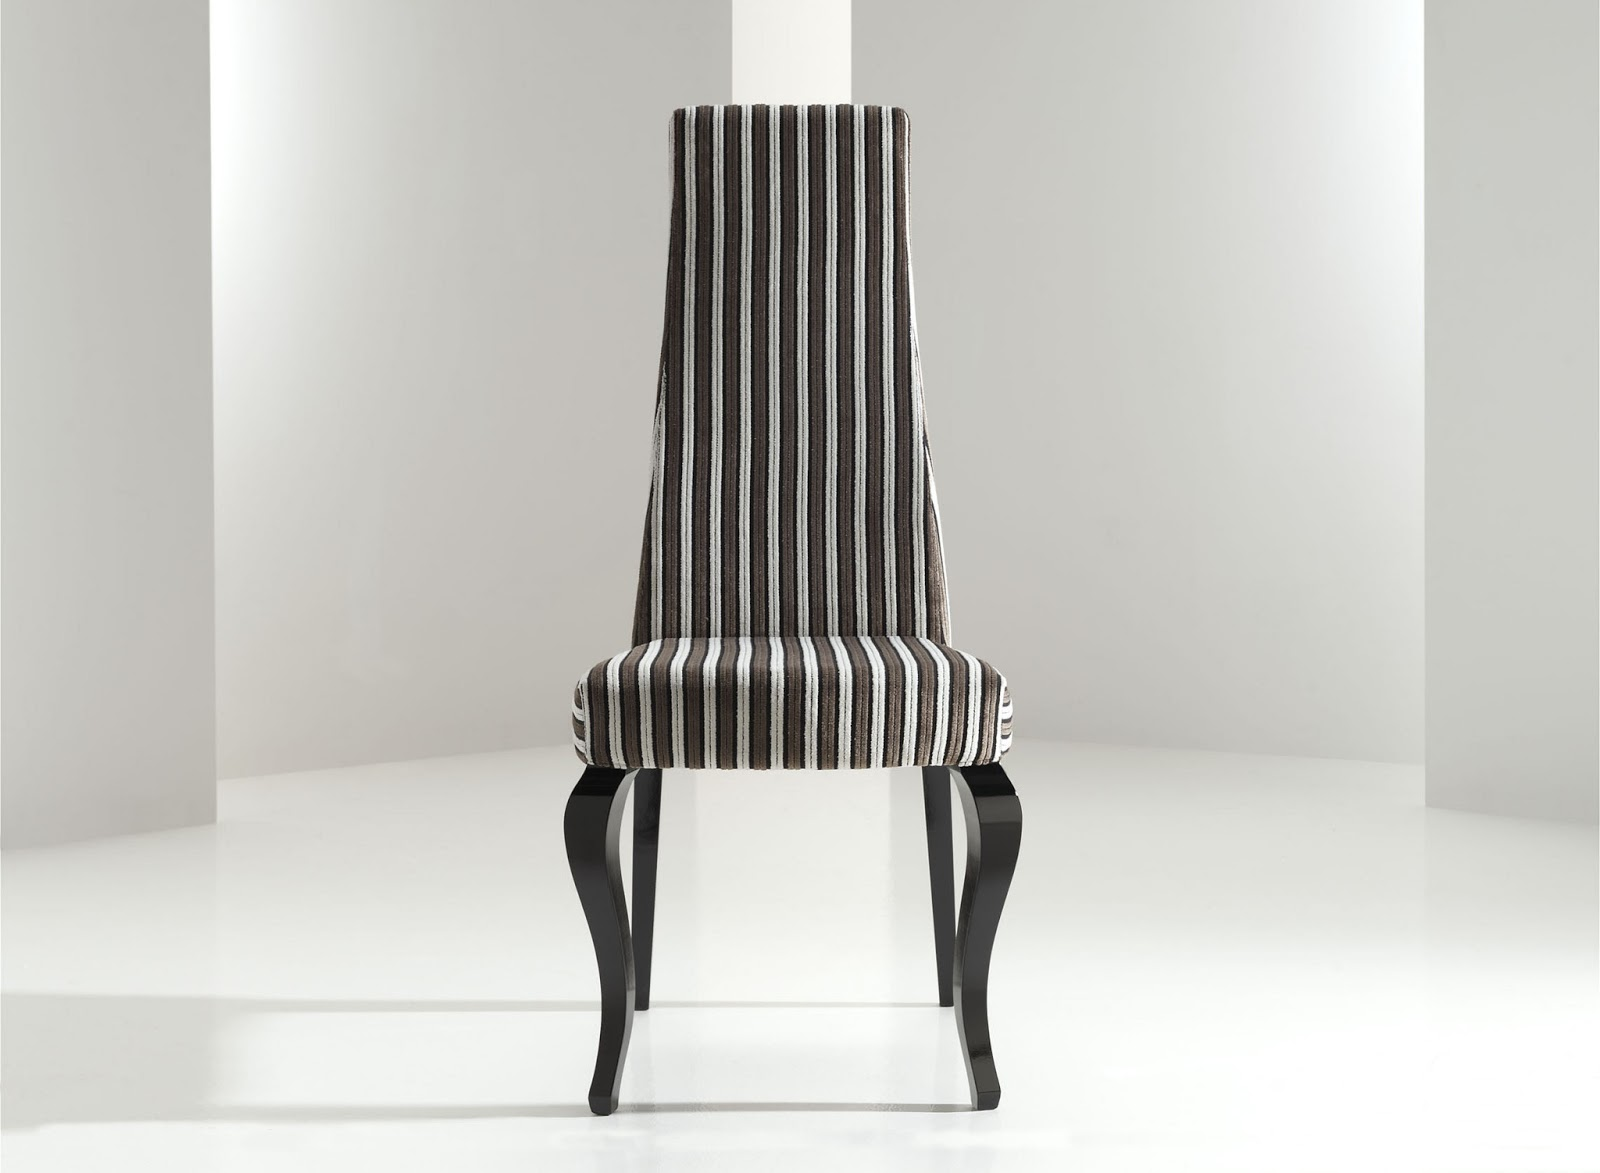 Decorando dormitorios lindas sillas de comedor tapizadas for Sillas comedor